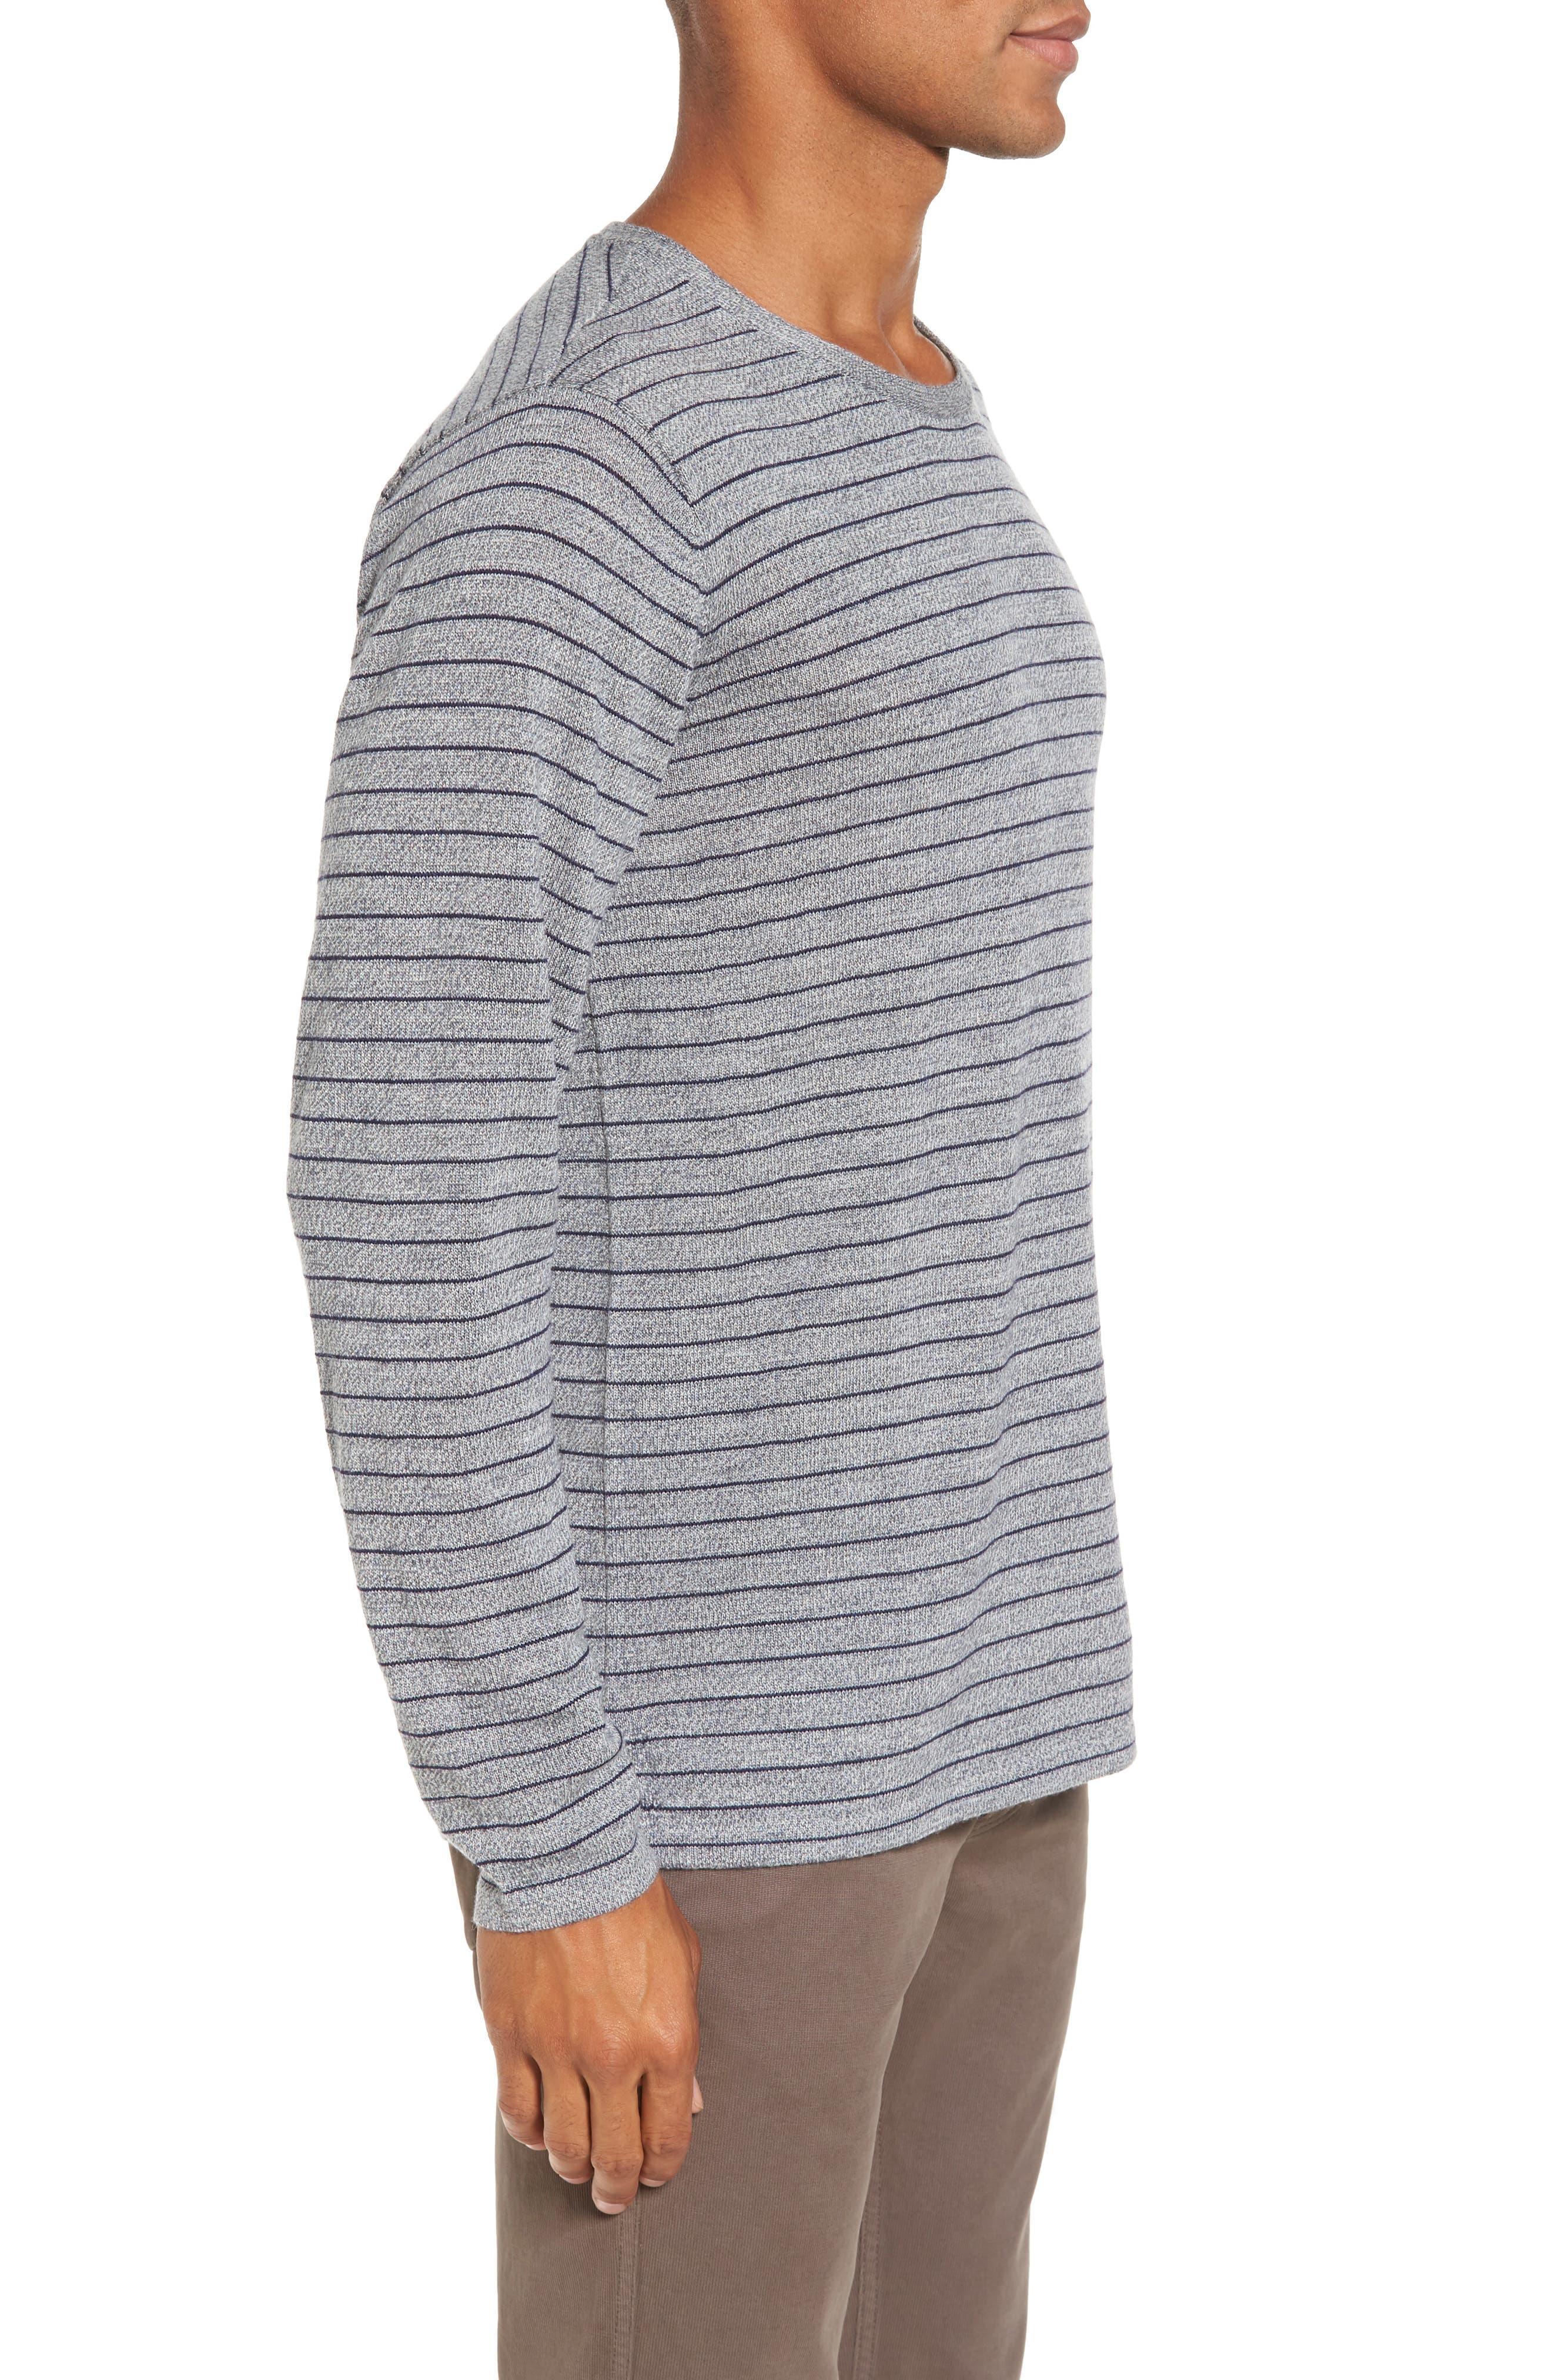 Nori Stripe Merino Wool T-Shirt,                             Alternate thumbnail 3, color,                             Heather Ink